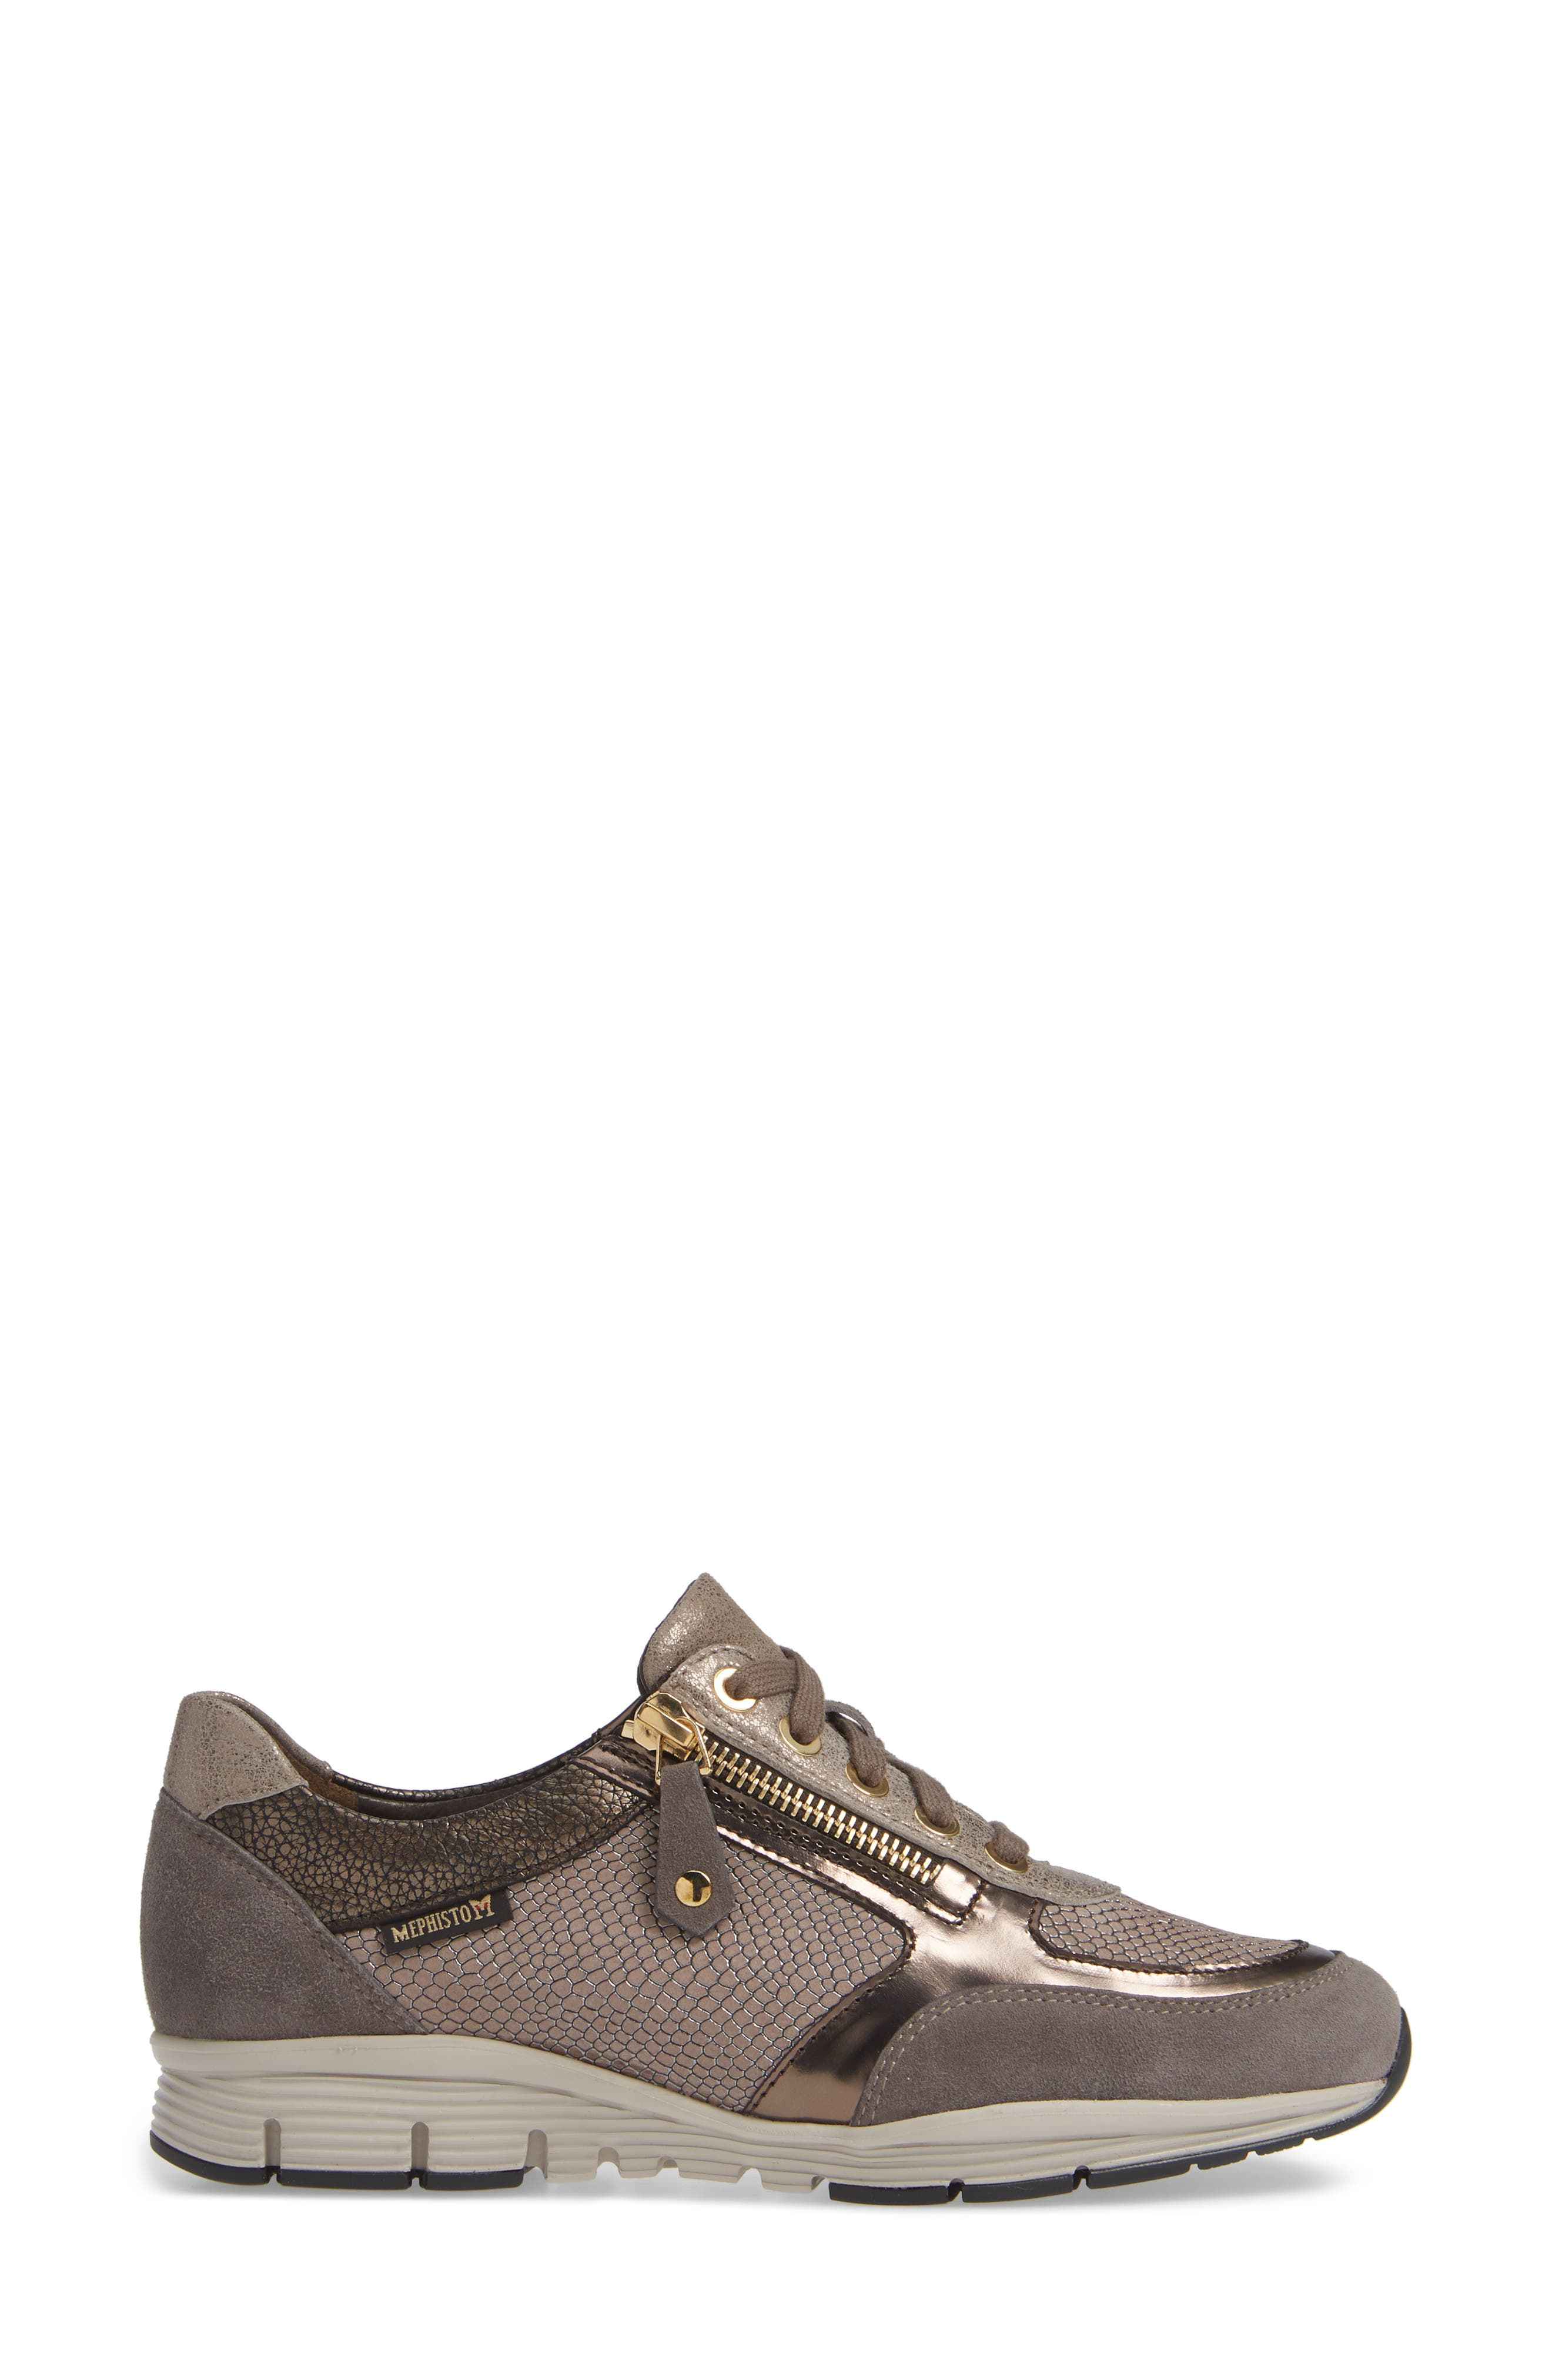 MEPHISTO, Ylona Sneaker, Alternate thumbnail 3, color, DARK GREY SUEDE